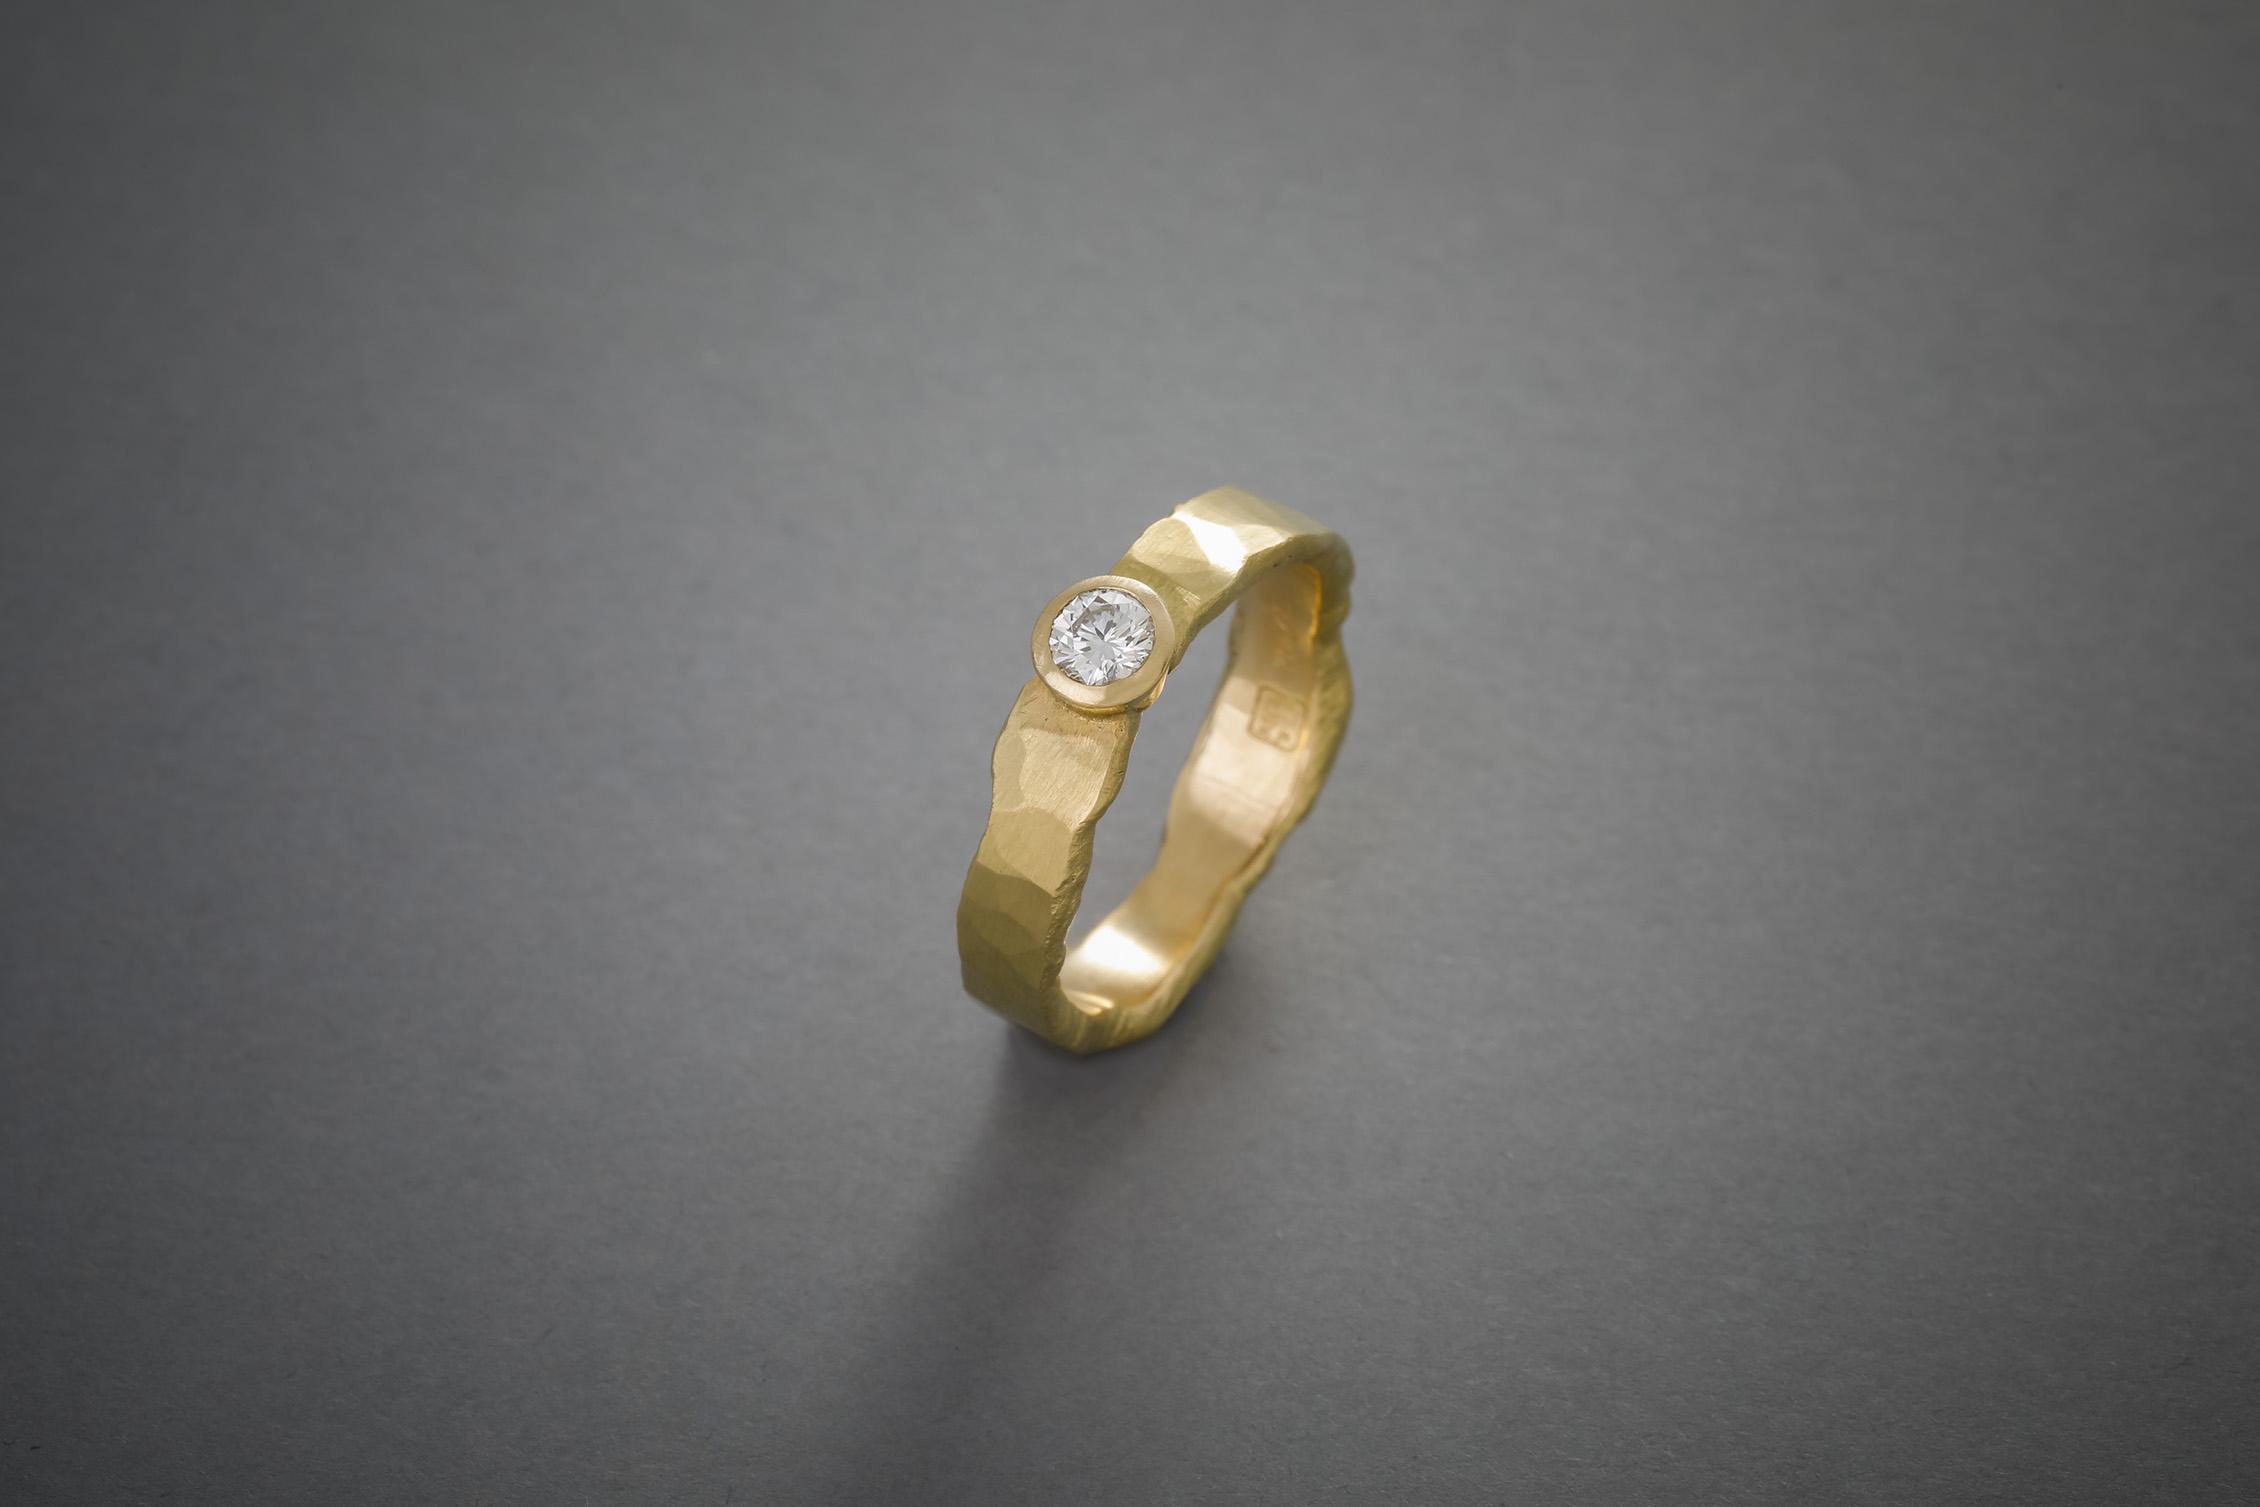 045 18kt Goldring, Brillant, ab € 1628,-